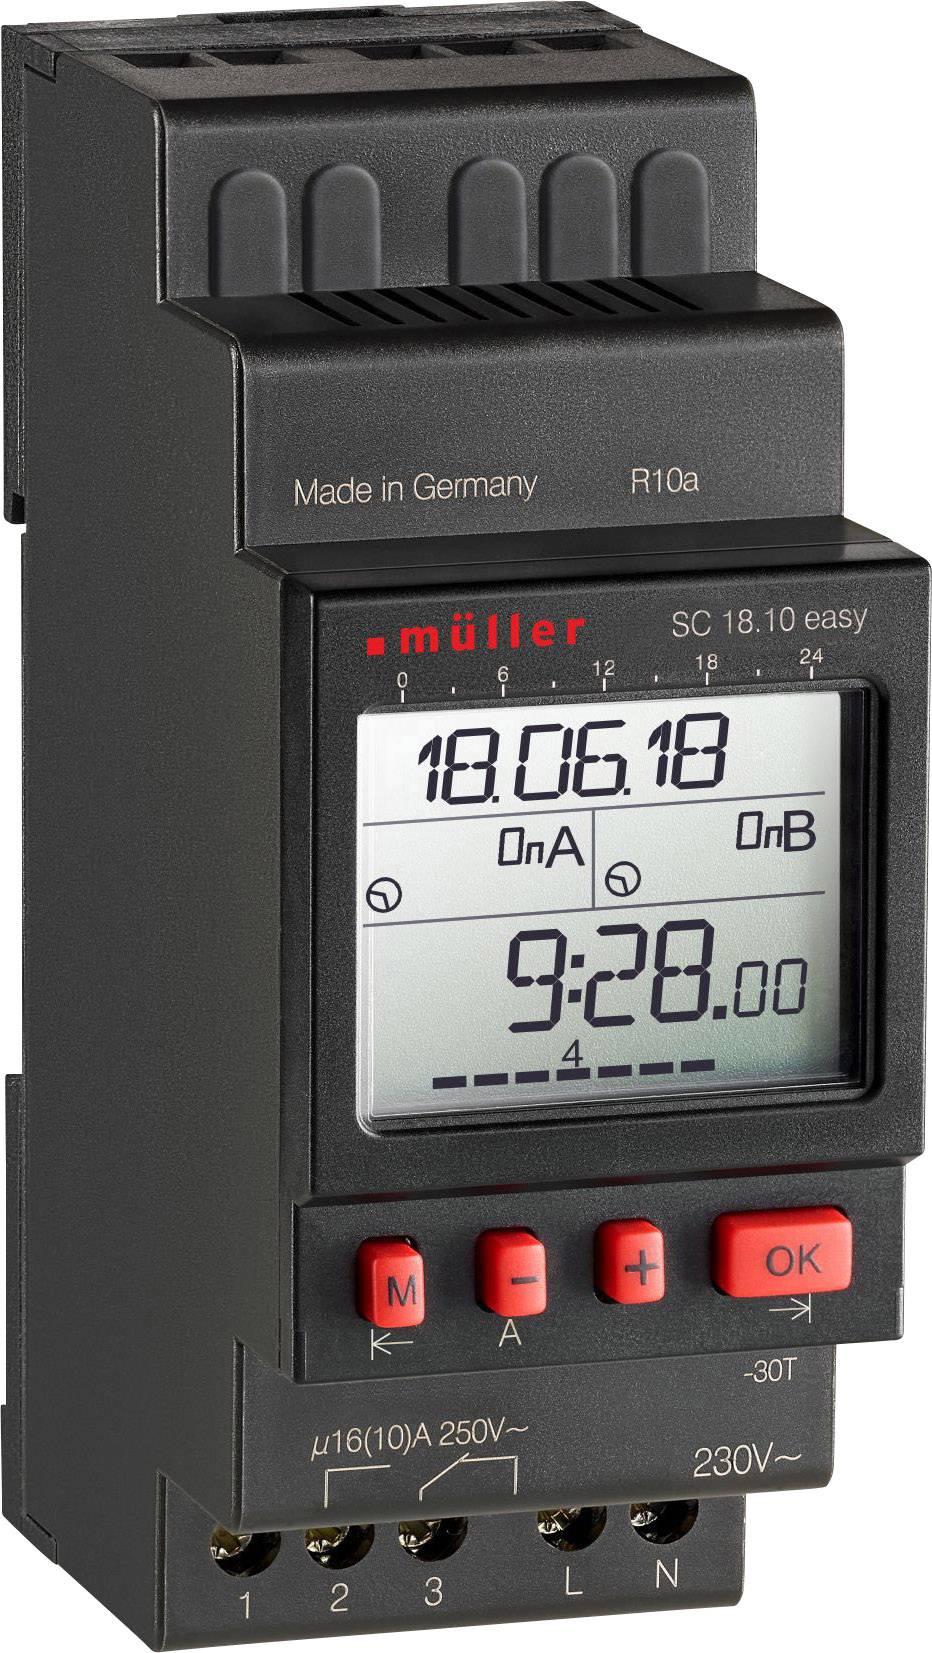 Müller SC 18.10 easy NFC Timer per guida DIN 230 V 16 A/250 V